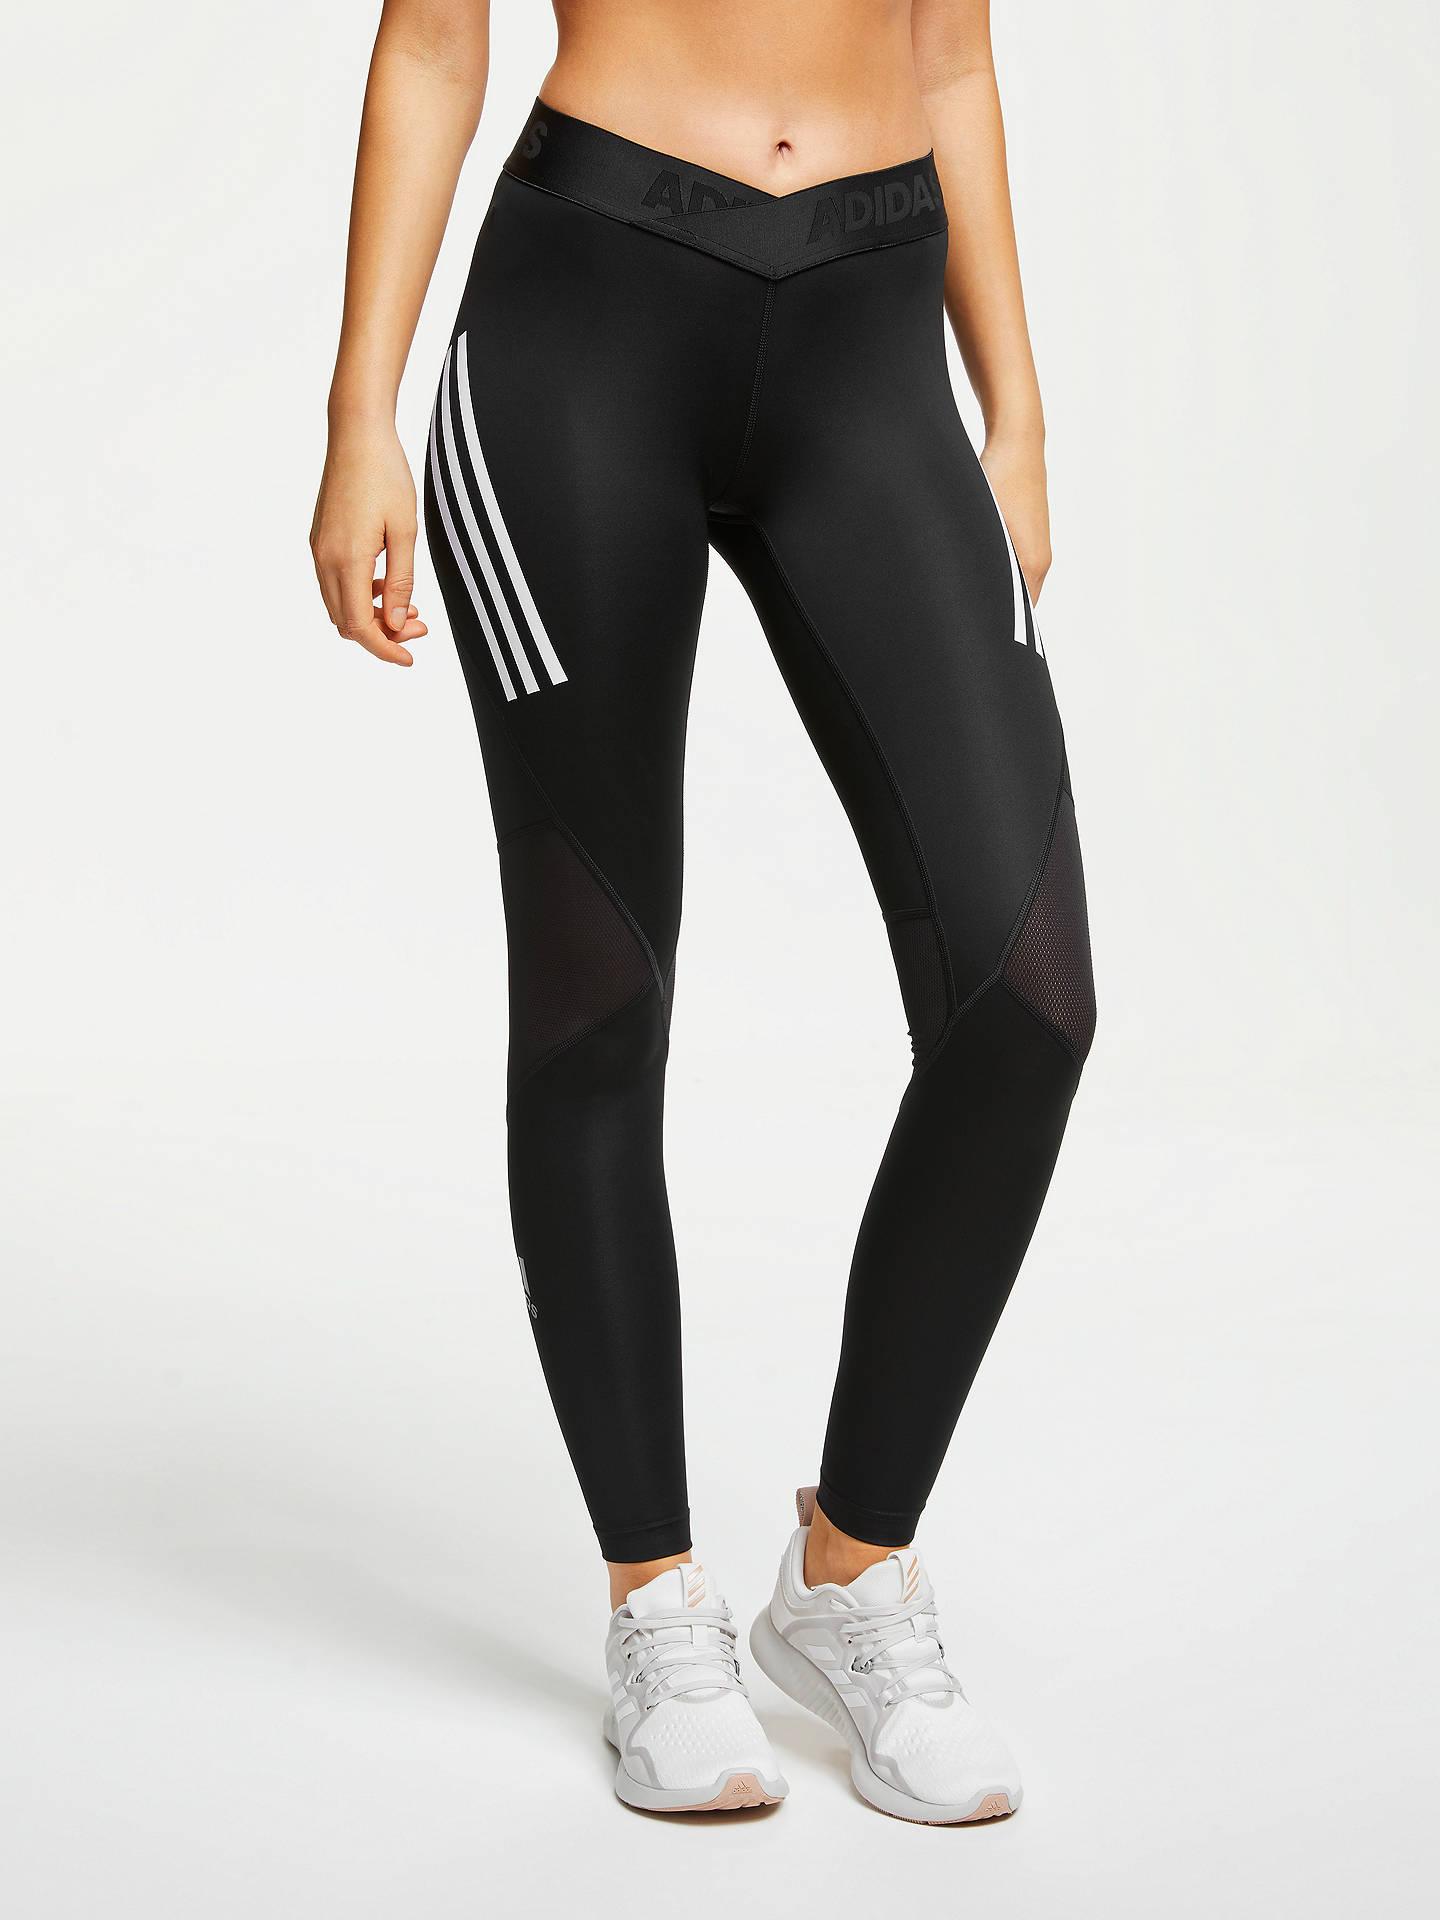 6ca907b8841a7 Buy adidas Alphaskin Sport 3-Stripes Long Training Tights, Black, M Online  at ...